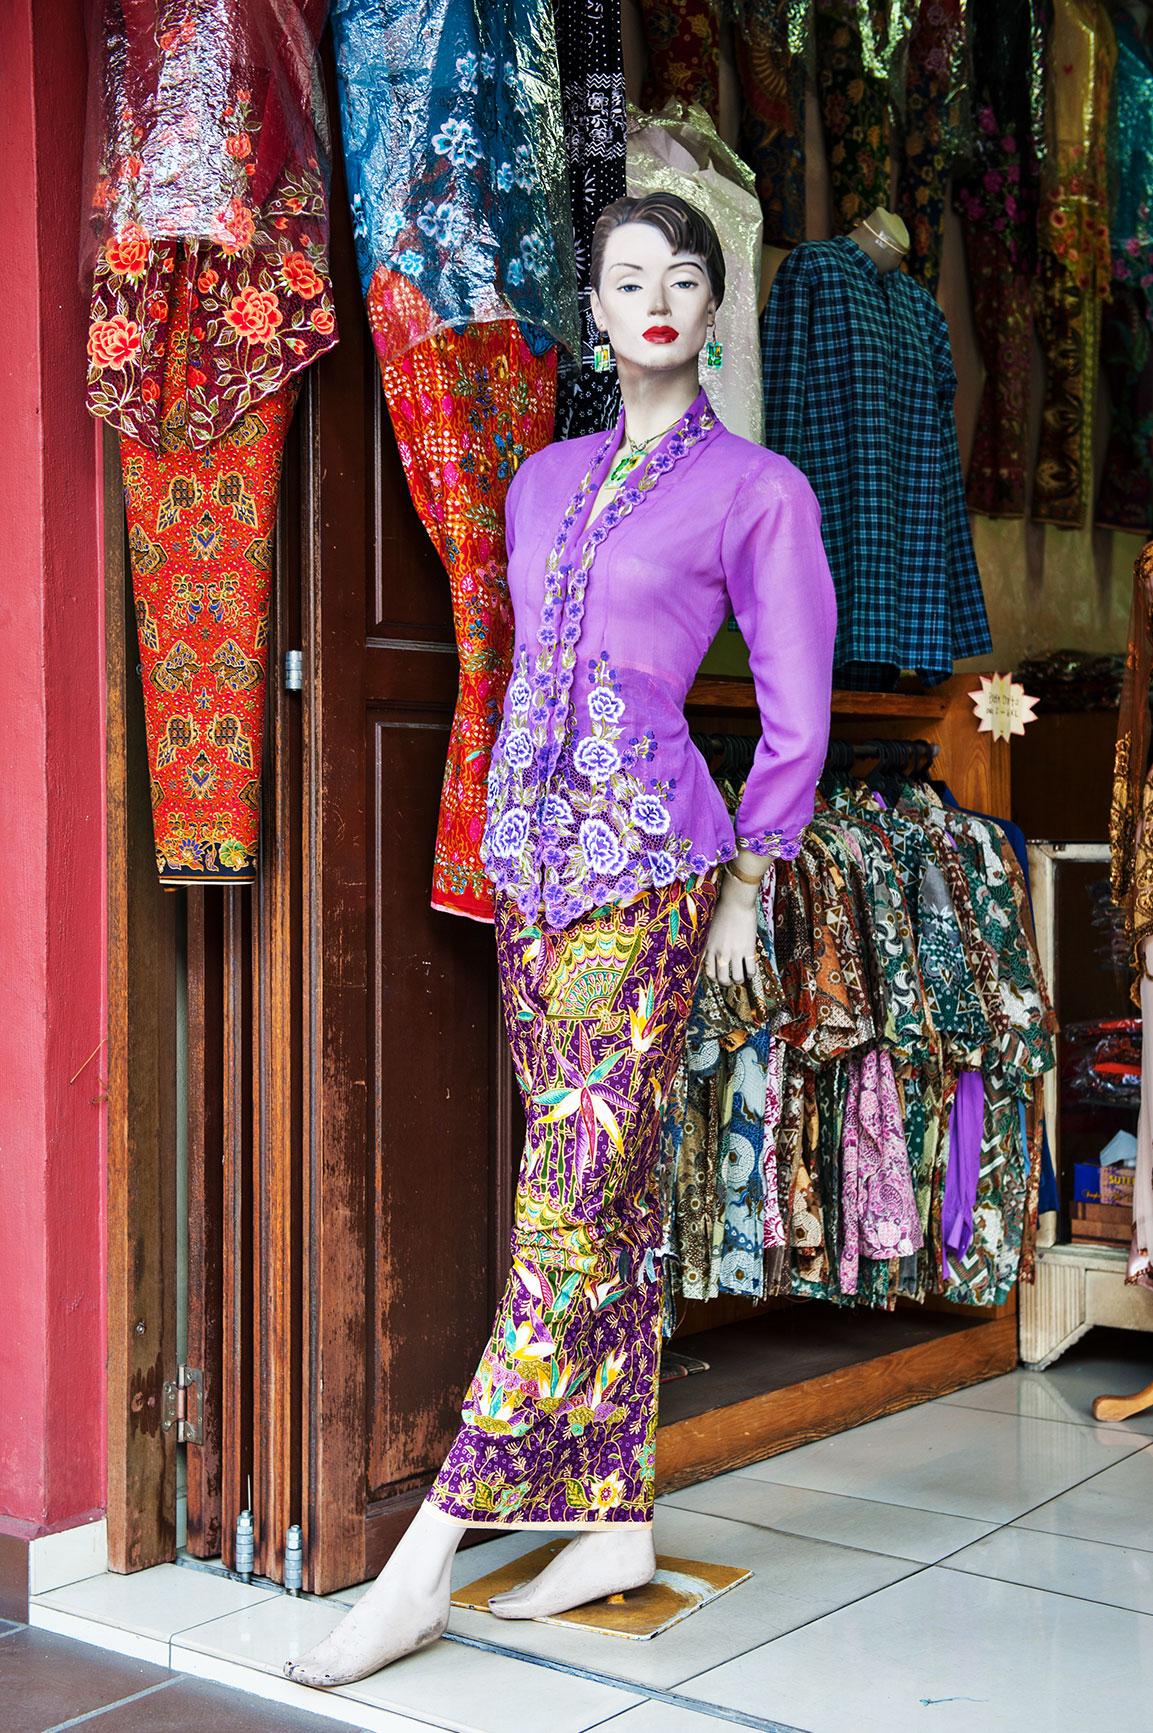 Malaysia_Melaka_Nyonya-dress_